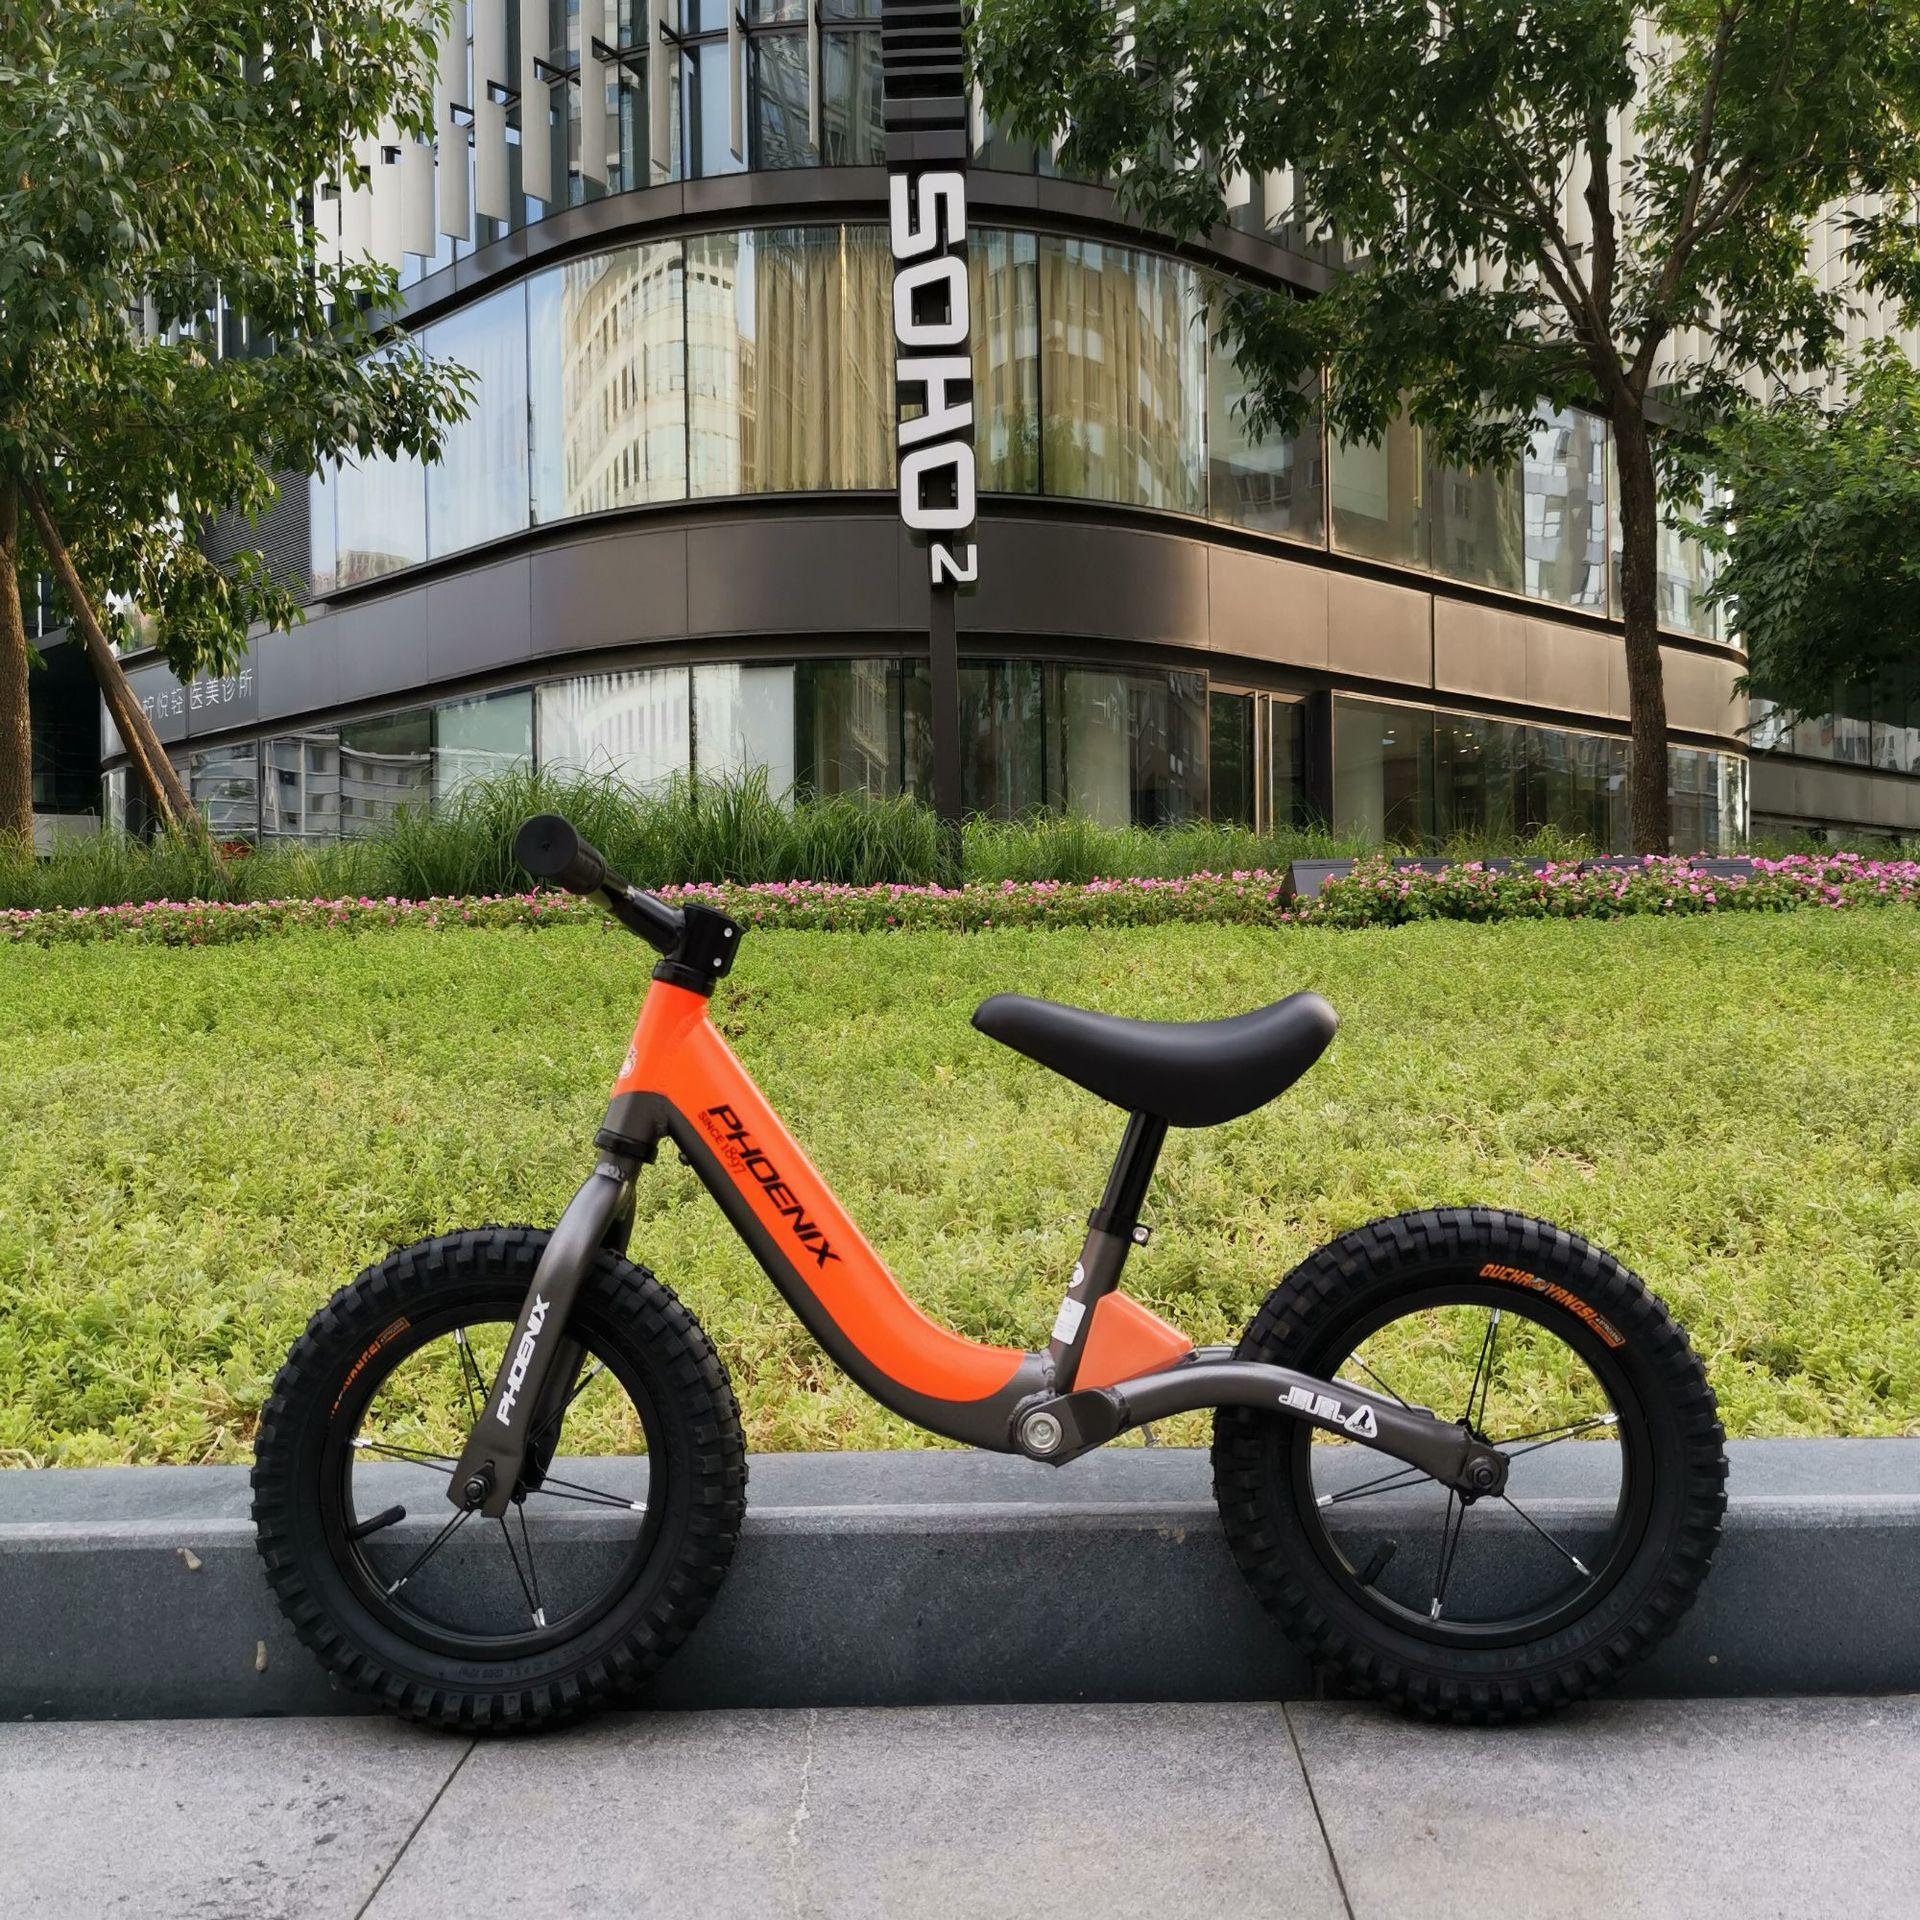 Phoenix 12 Inch Aluminum Balance Bike Toddler No Pedals For 2 – 6 Year Old – Orange, Blue 5